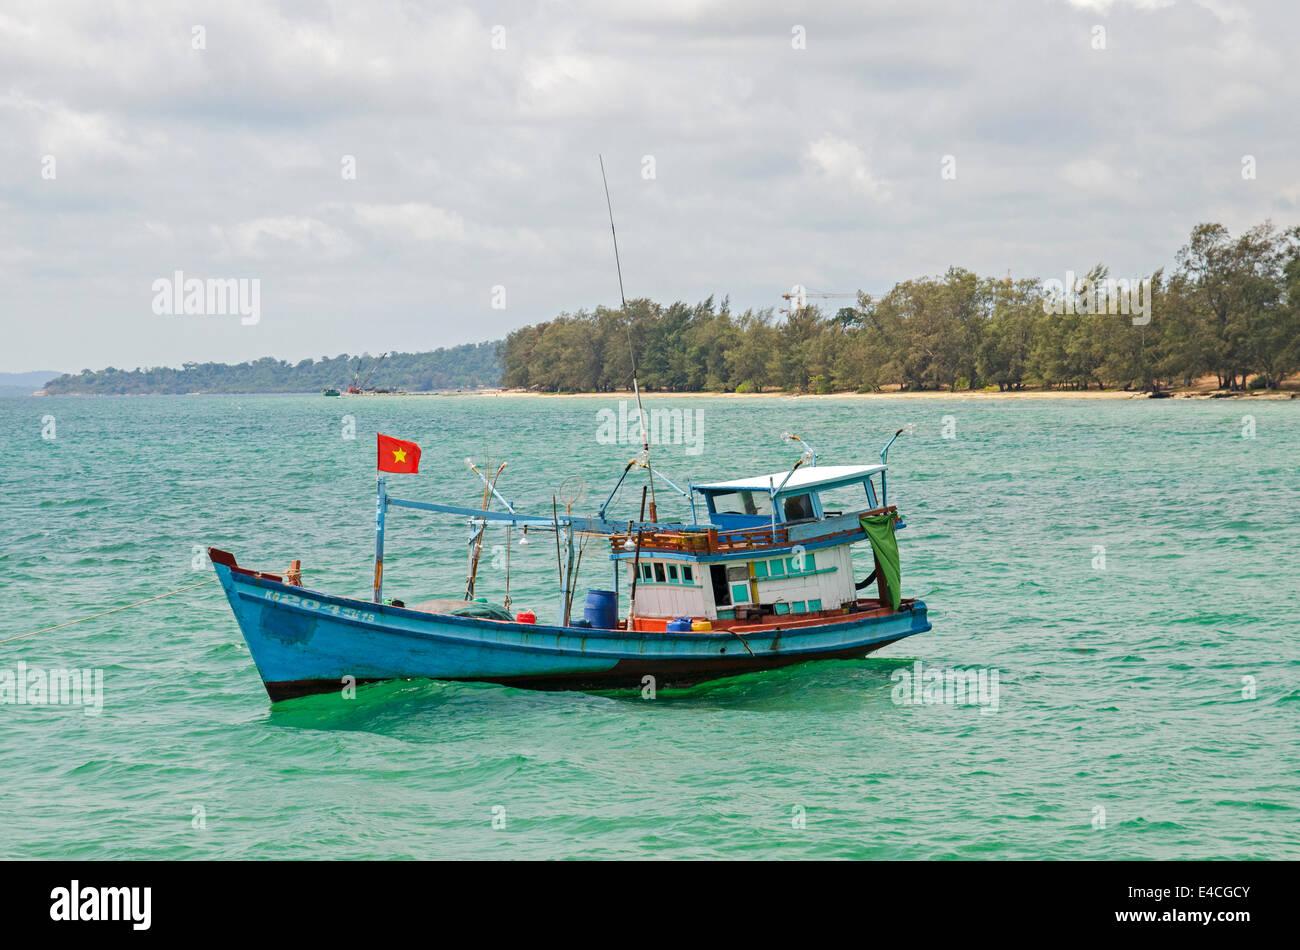 Blue fishing boat near Ong Lang Beach, Phu Quoc Island, Vietnam - Stock Image